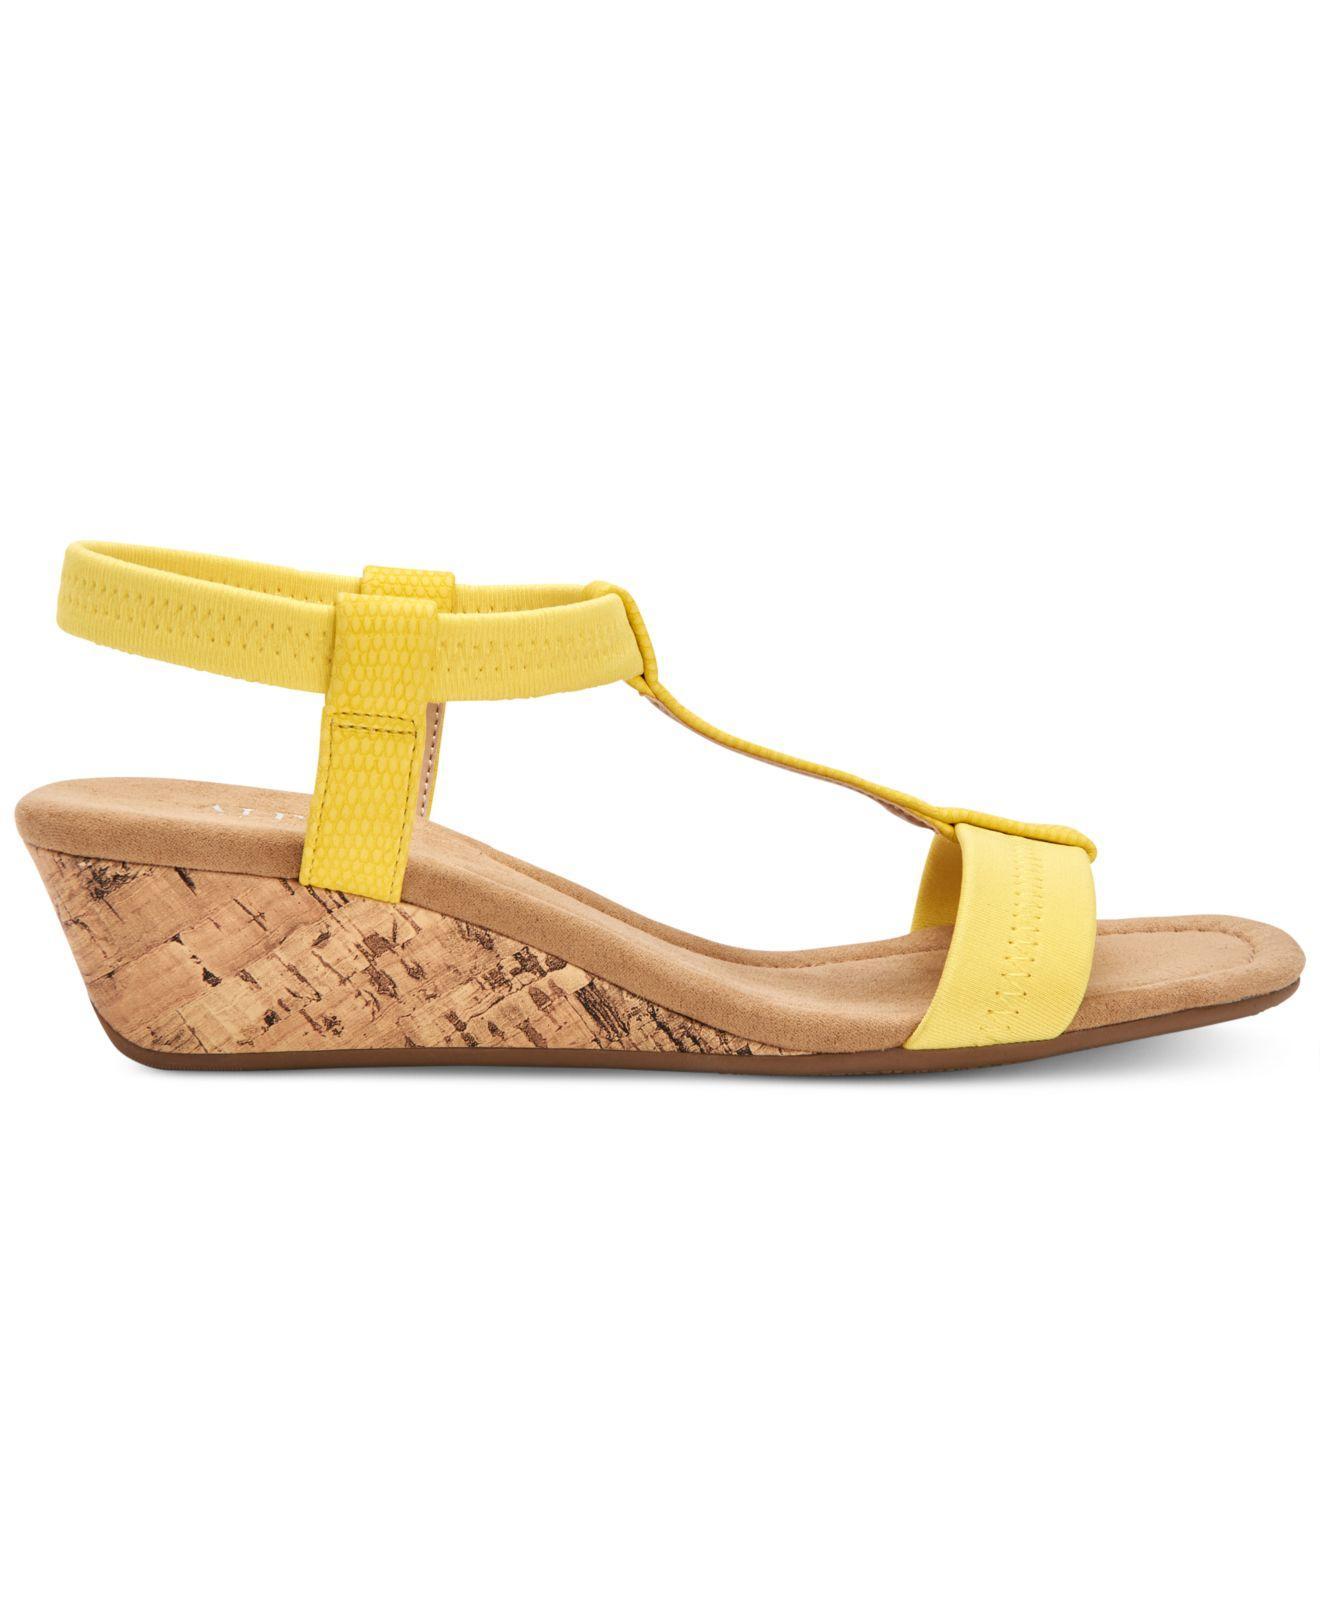 437f283bb80 Lyst - Alfani Step  n Flex Voyage Wedge Sandals